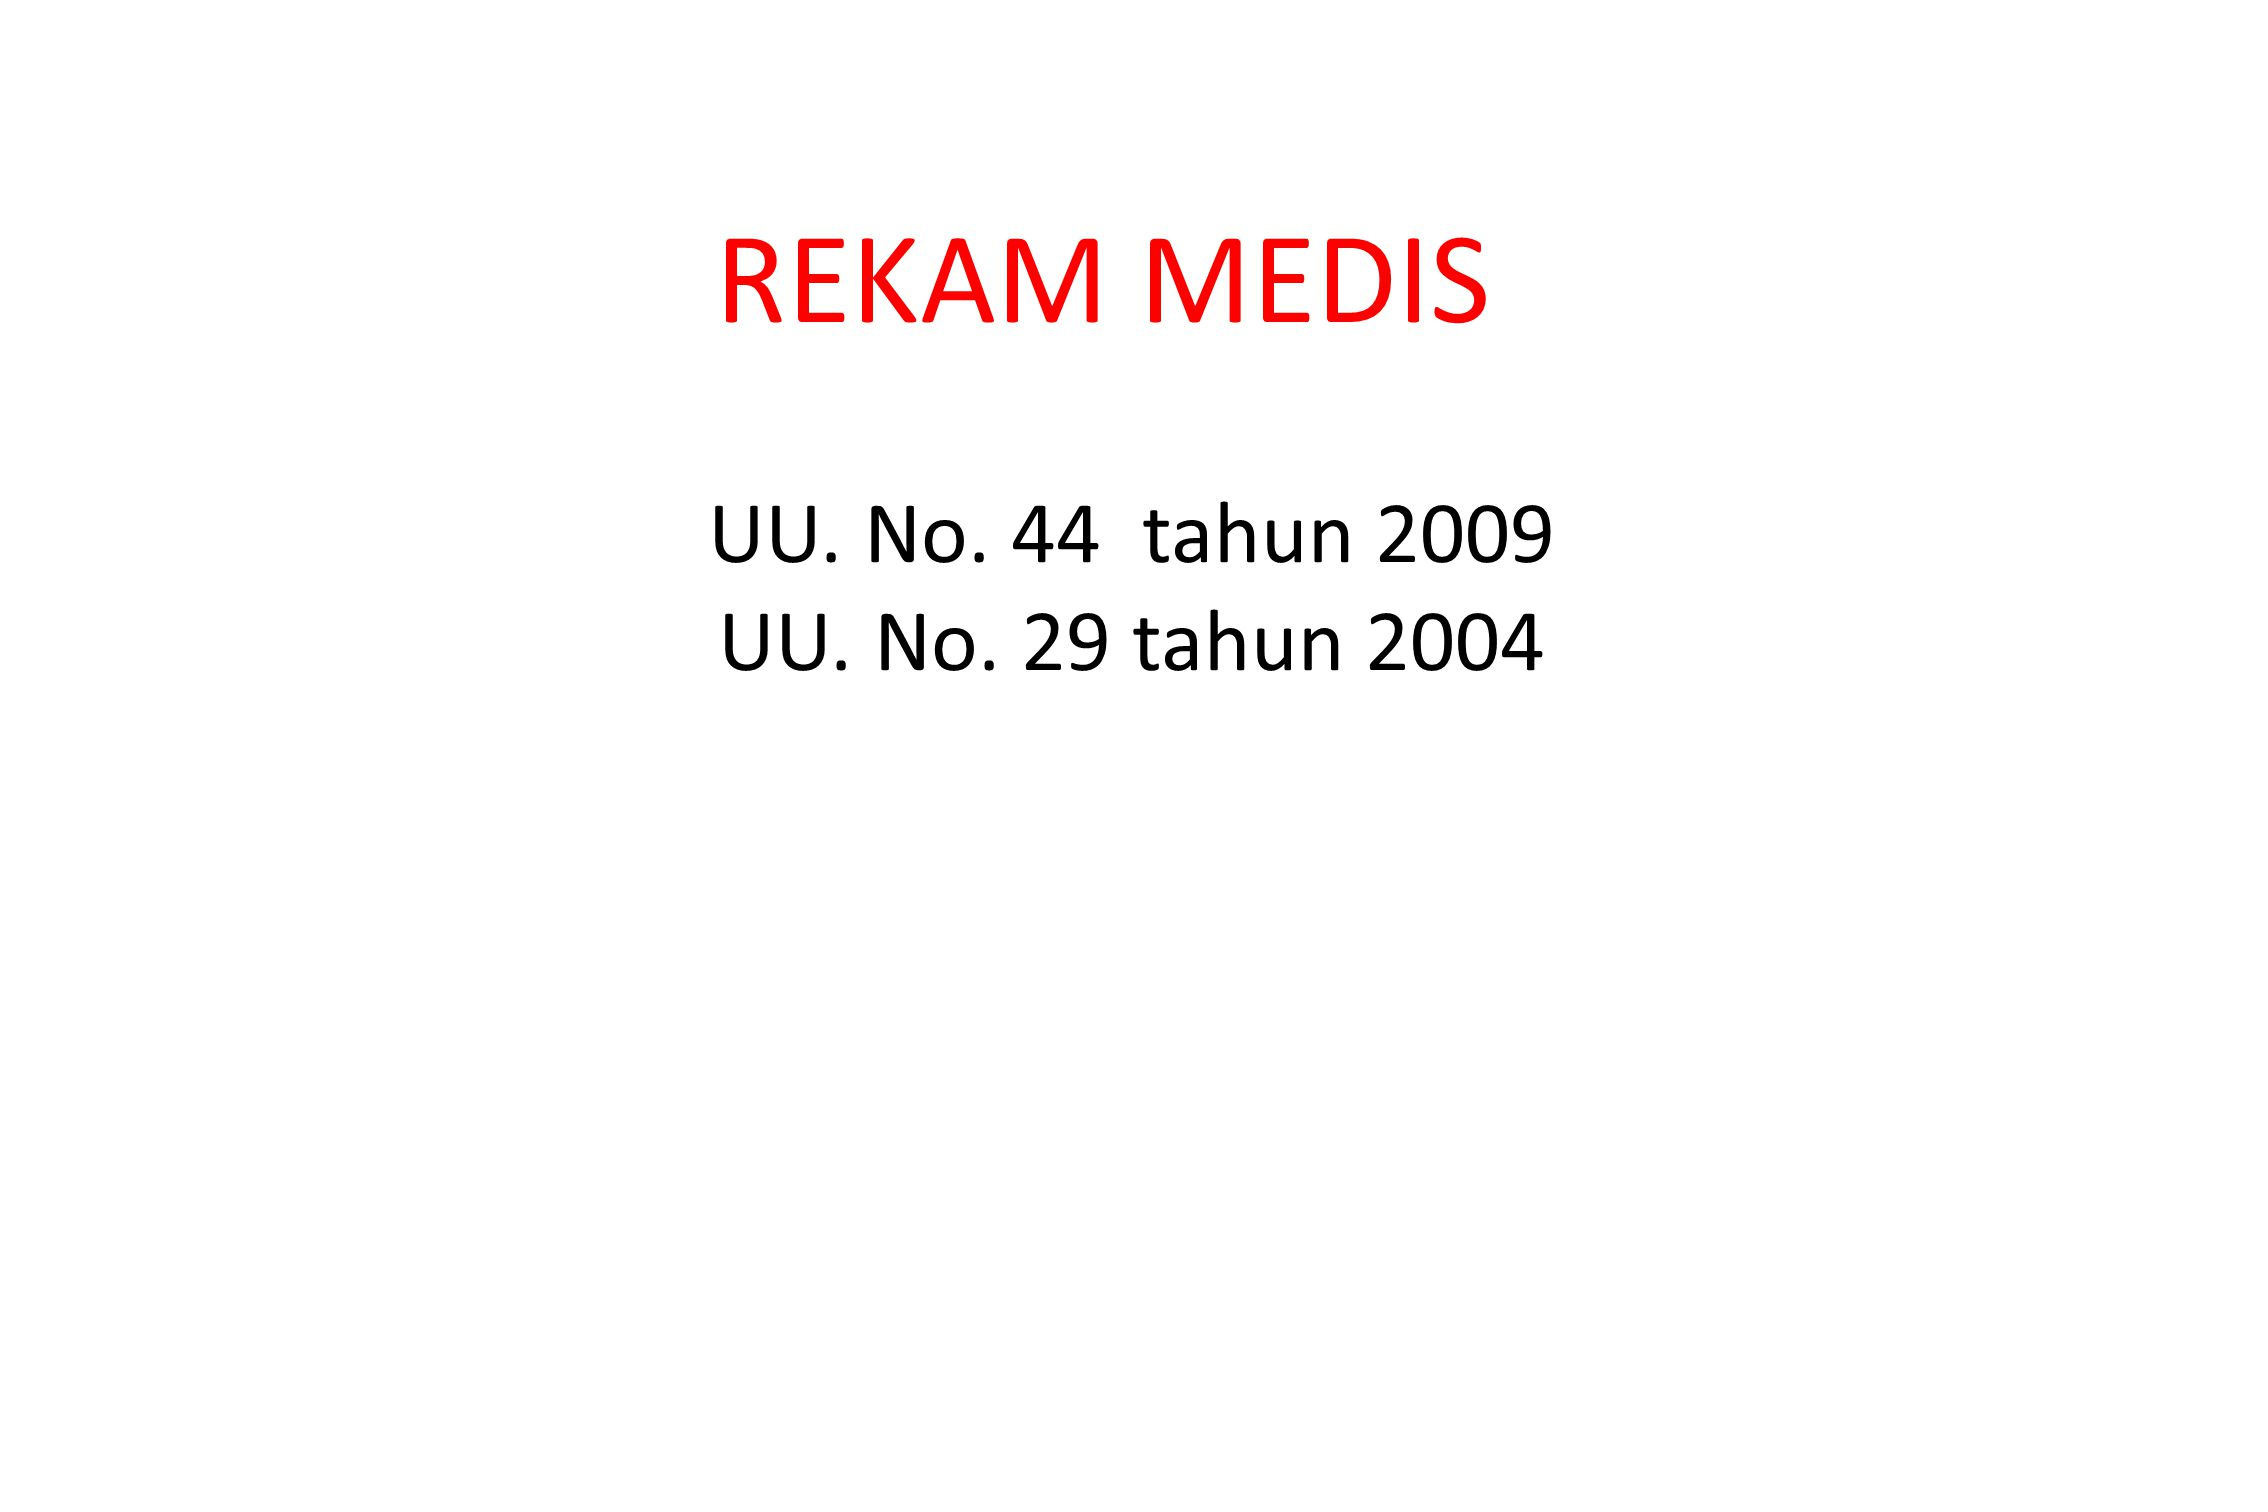 REKAM MEDIS UU. No. 44 tahun 2009 UU. No. 29 tahun 2004